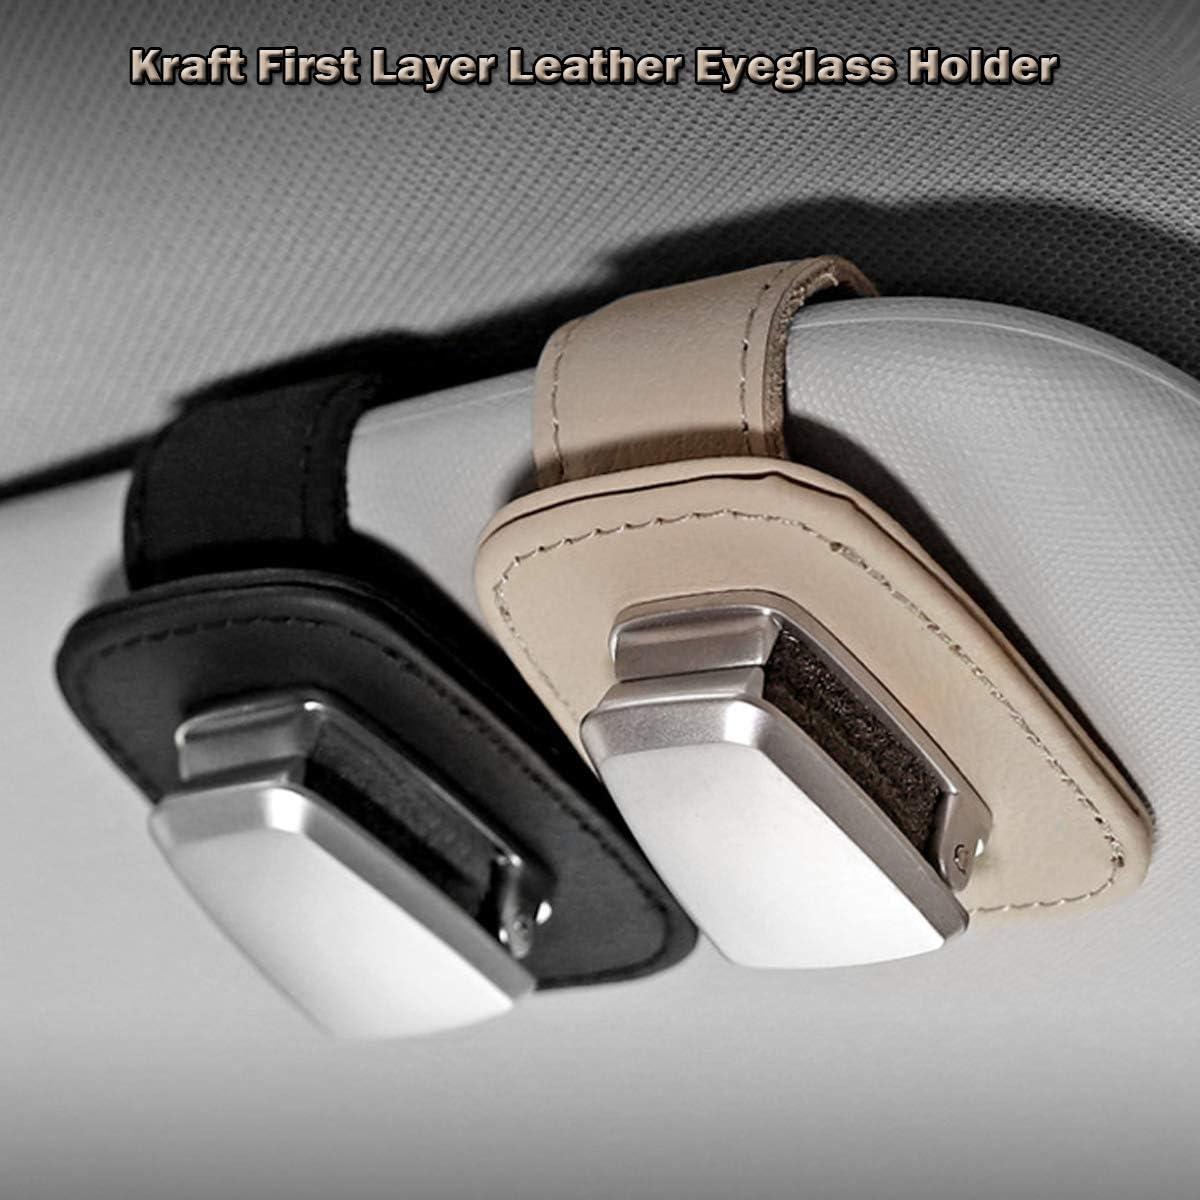 AUXMART Car Visor Sunglasses Leather Holder Beige Sunglasses Clip Suitable for All Models